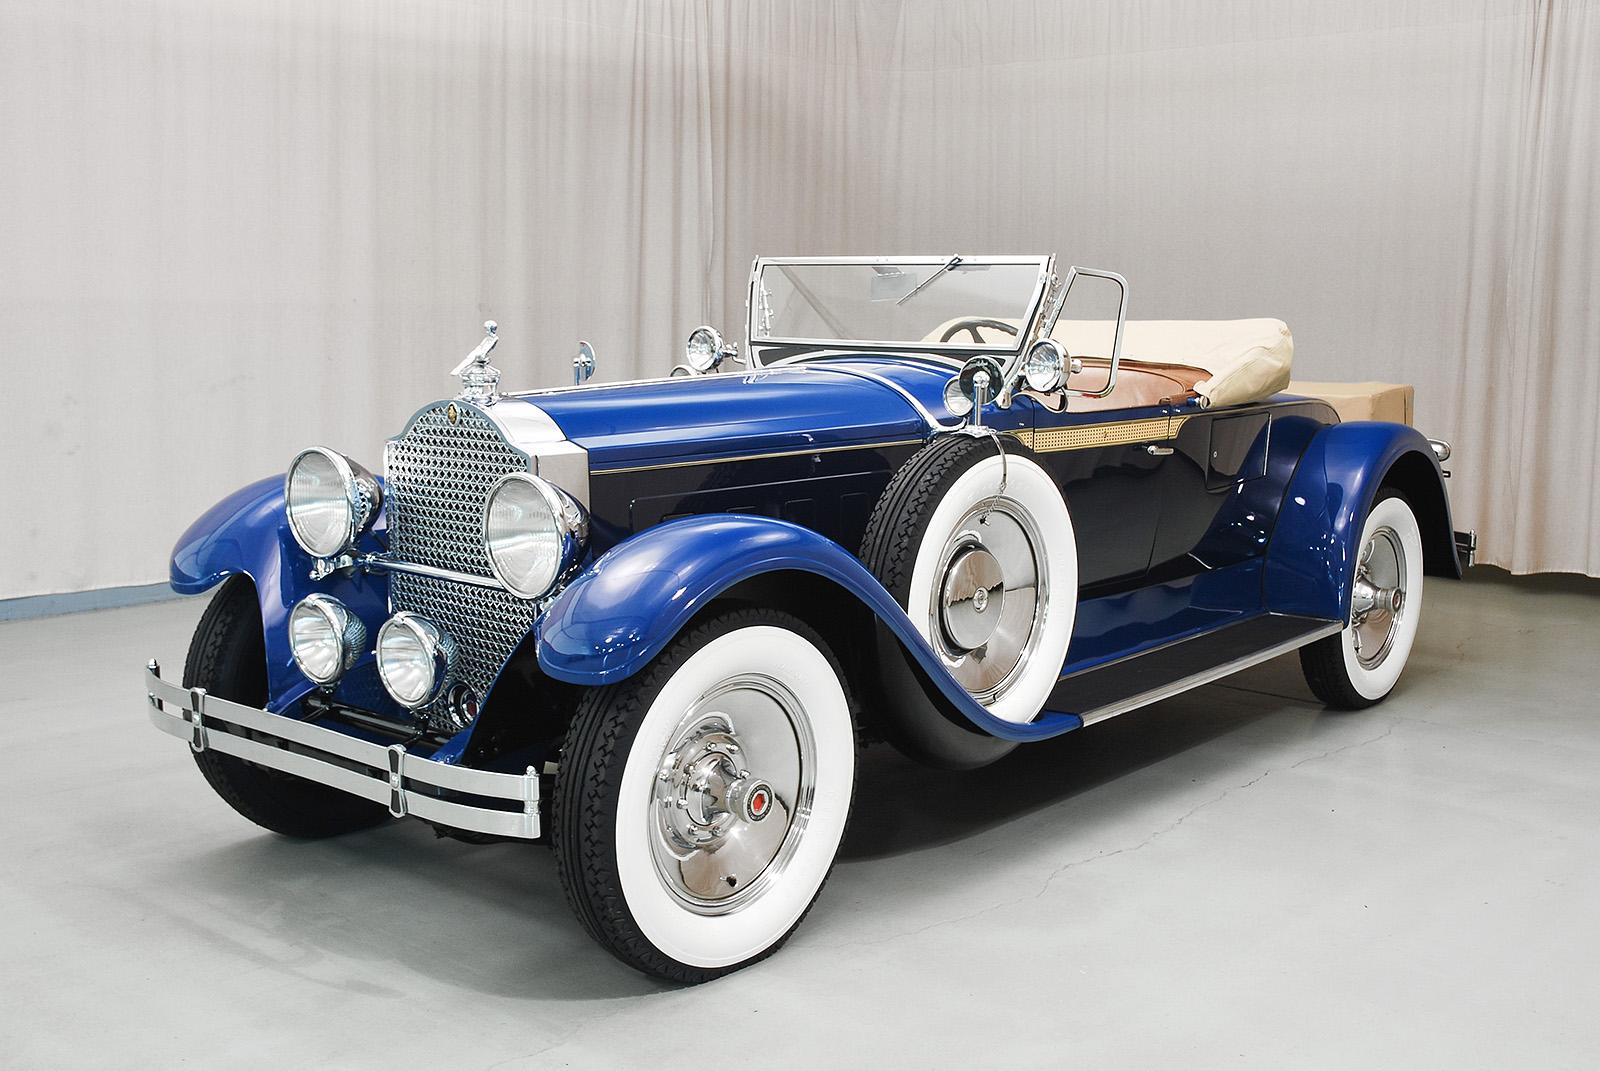 1929 640 Roadster